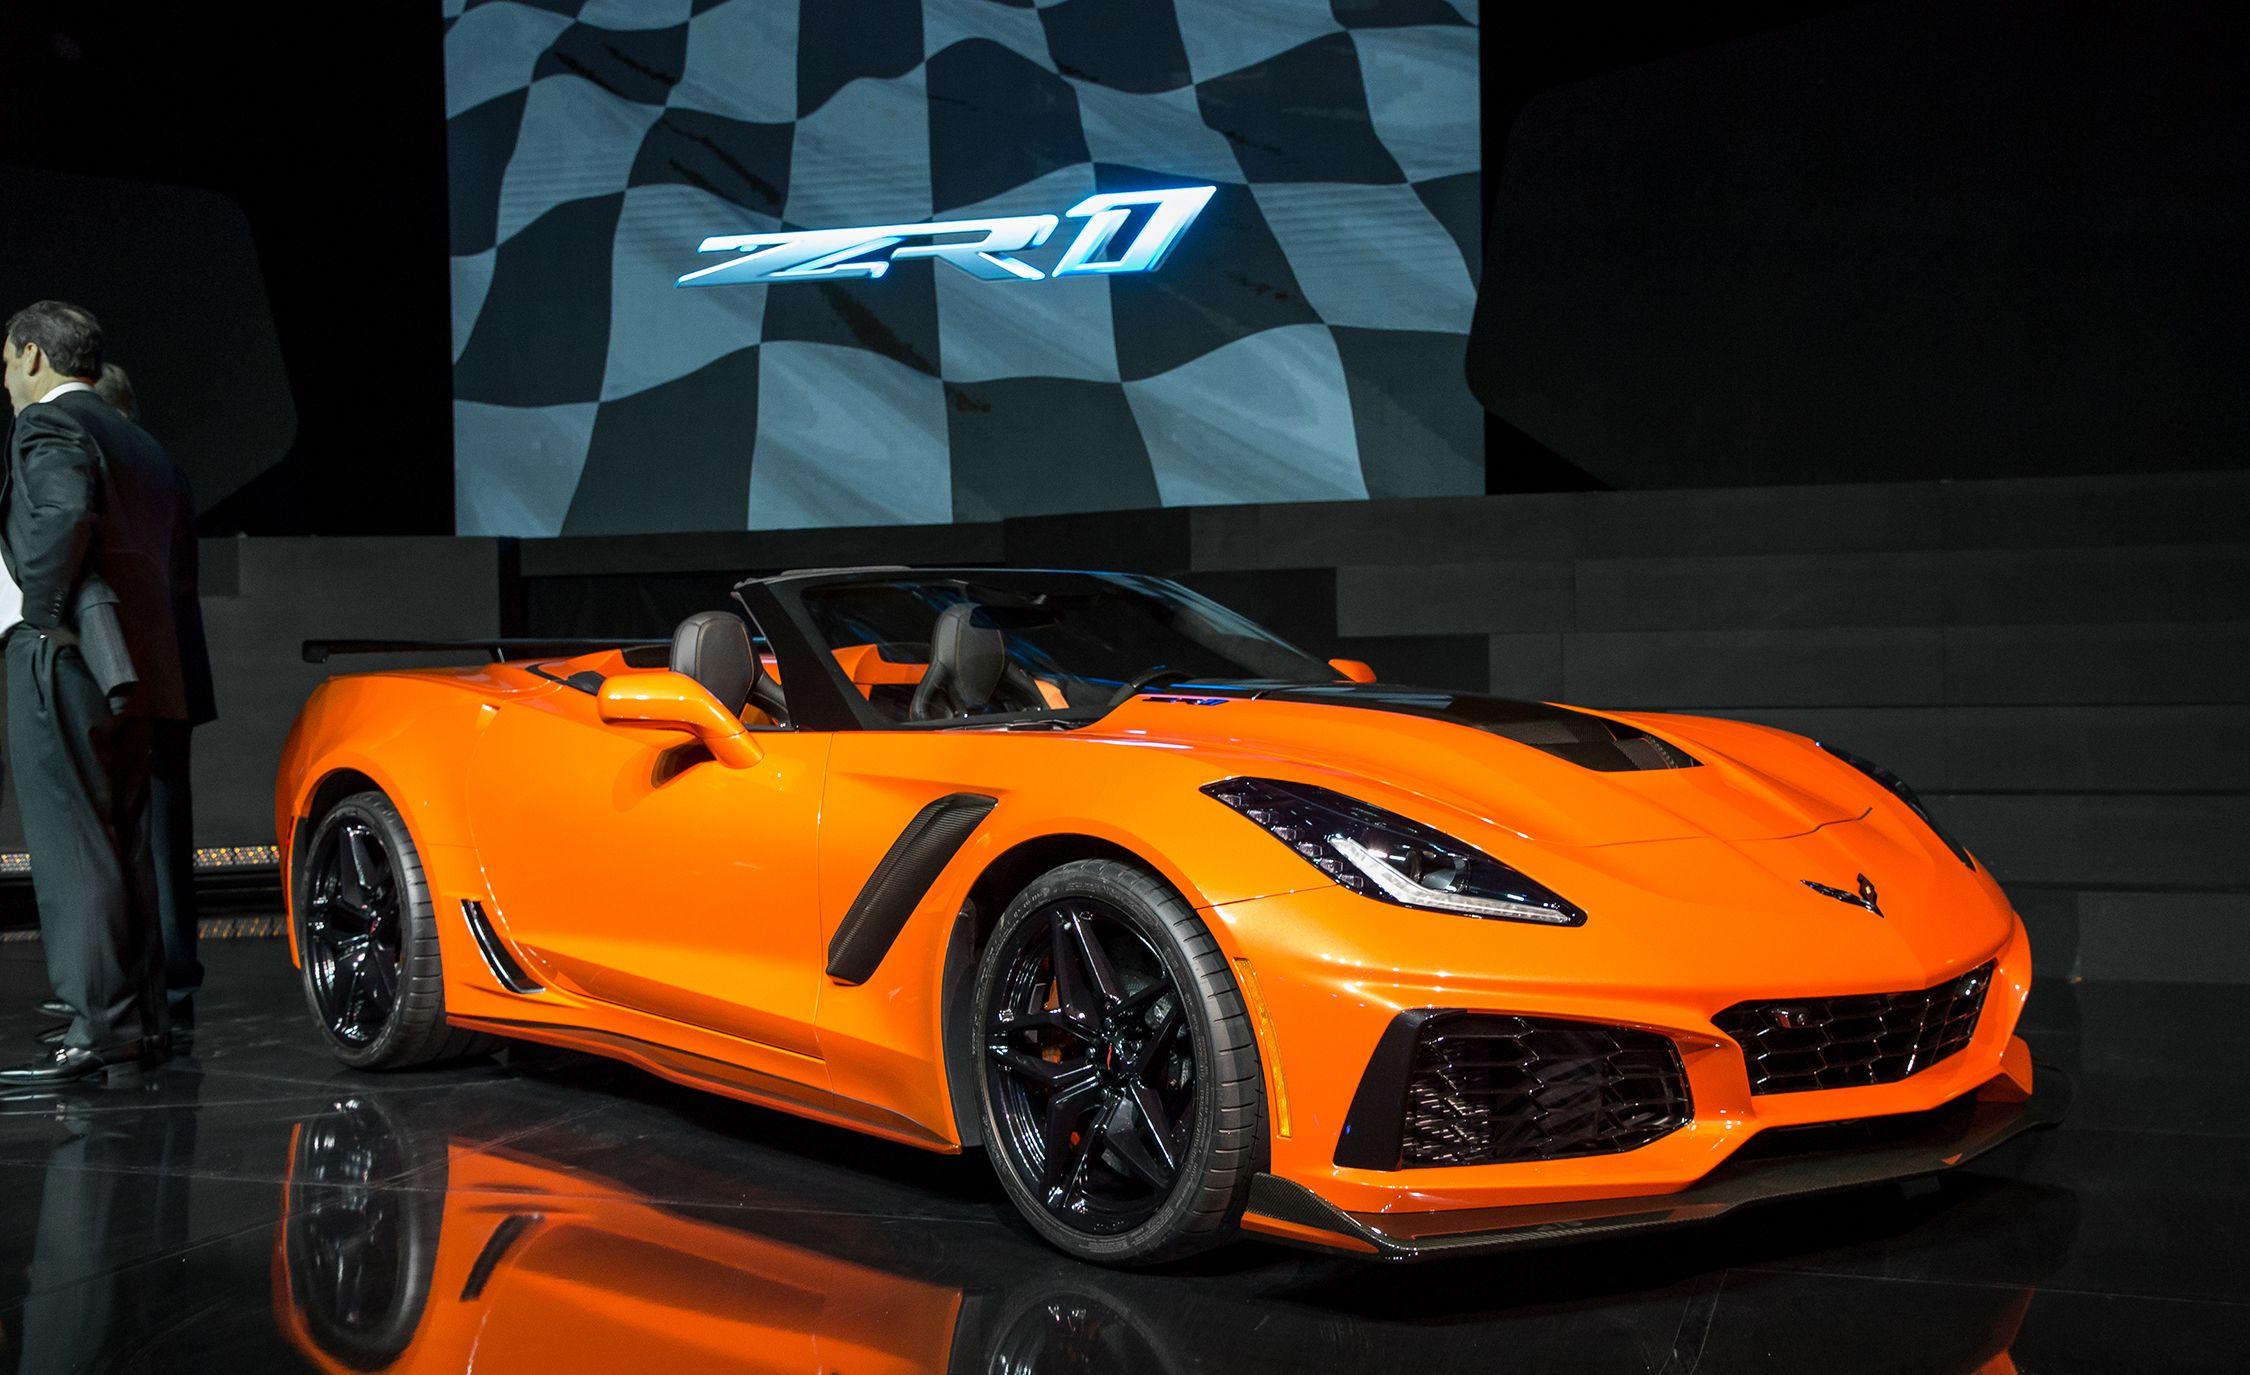 2018 chevy corvette zr1